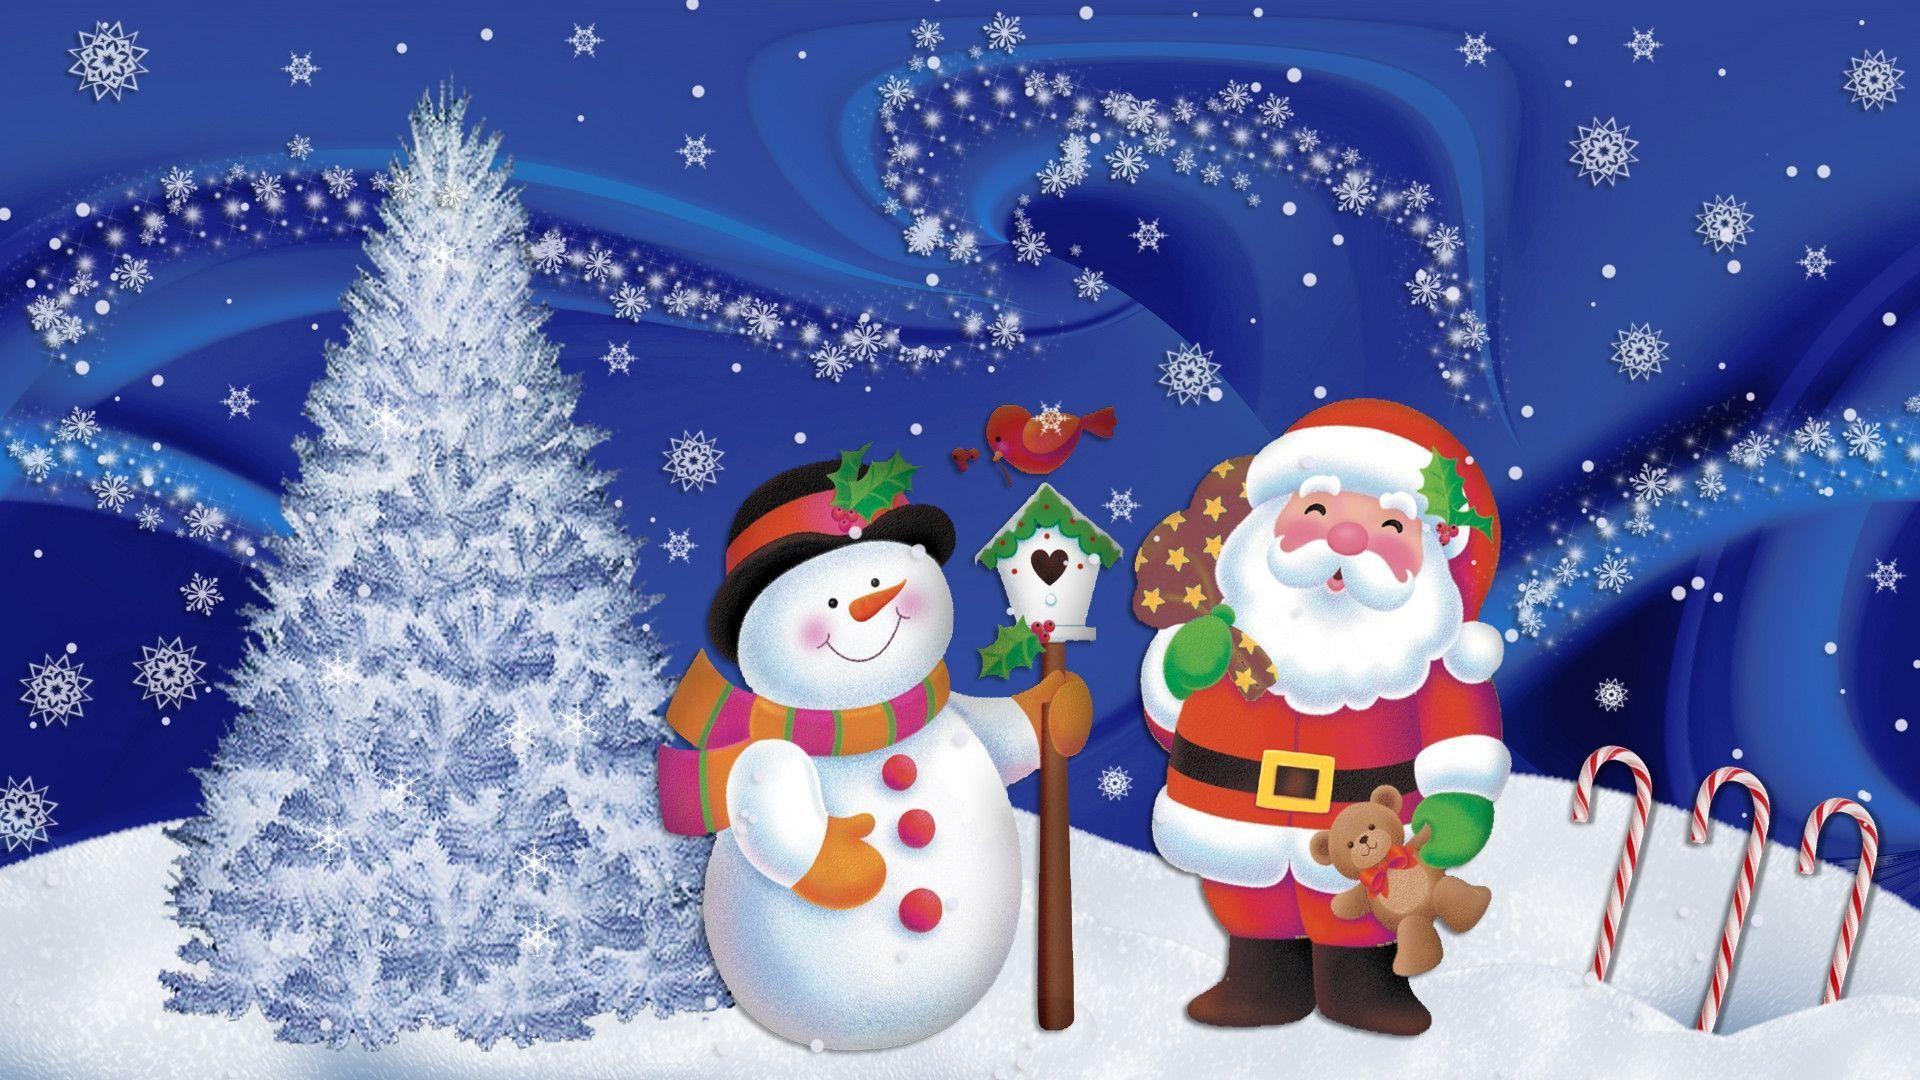 HD Desktop Wallpapers Christmas wallpaper download 1920x1080 1920x1080